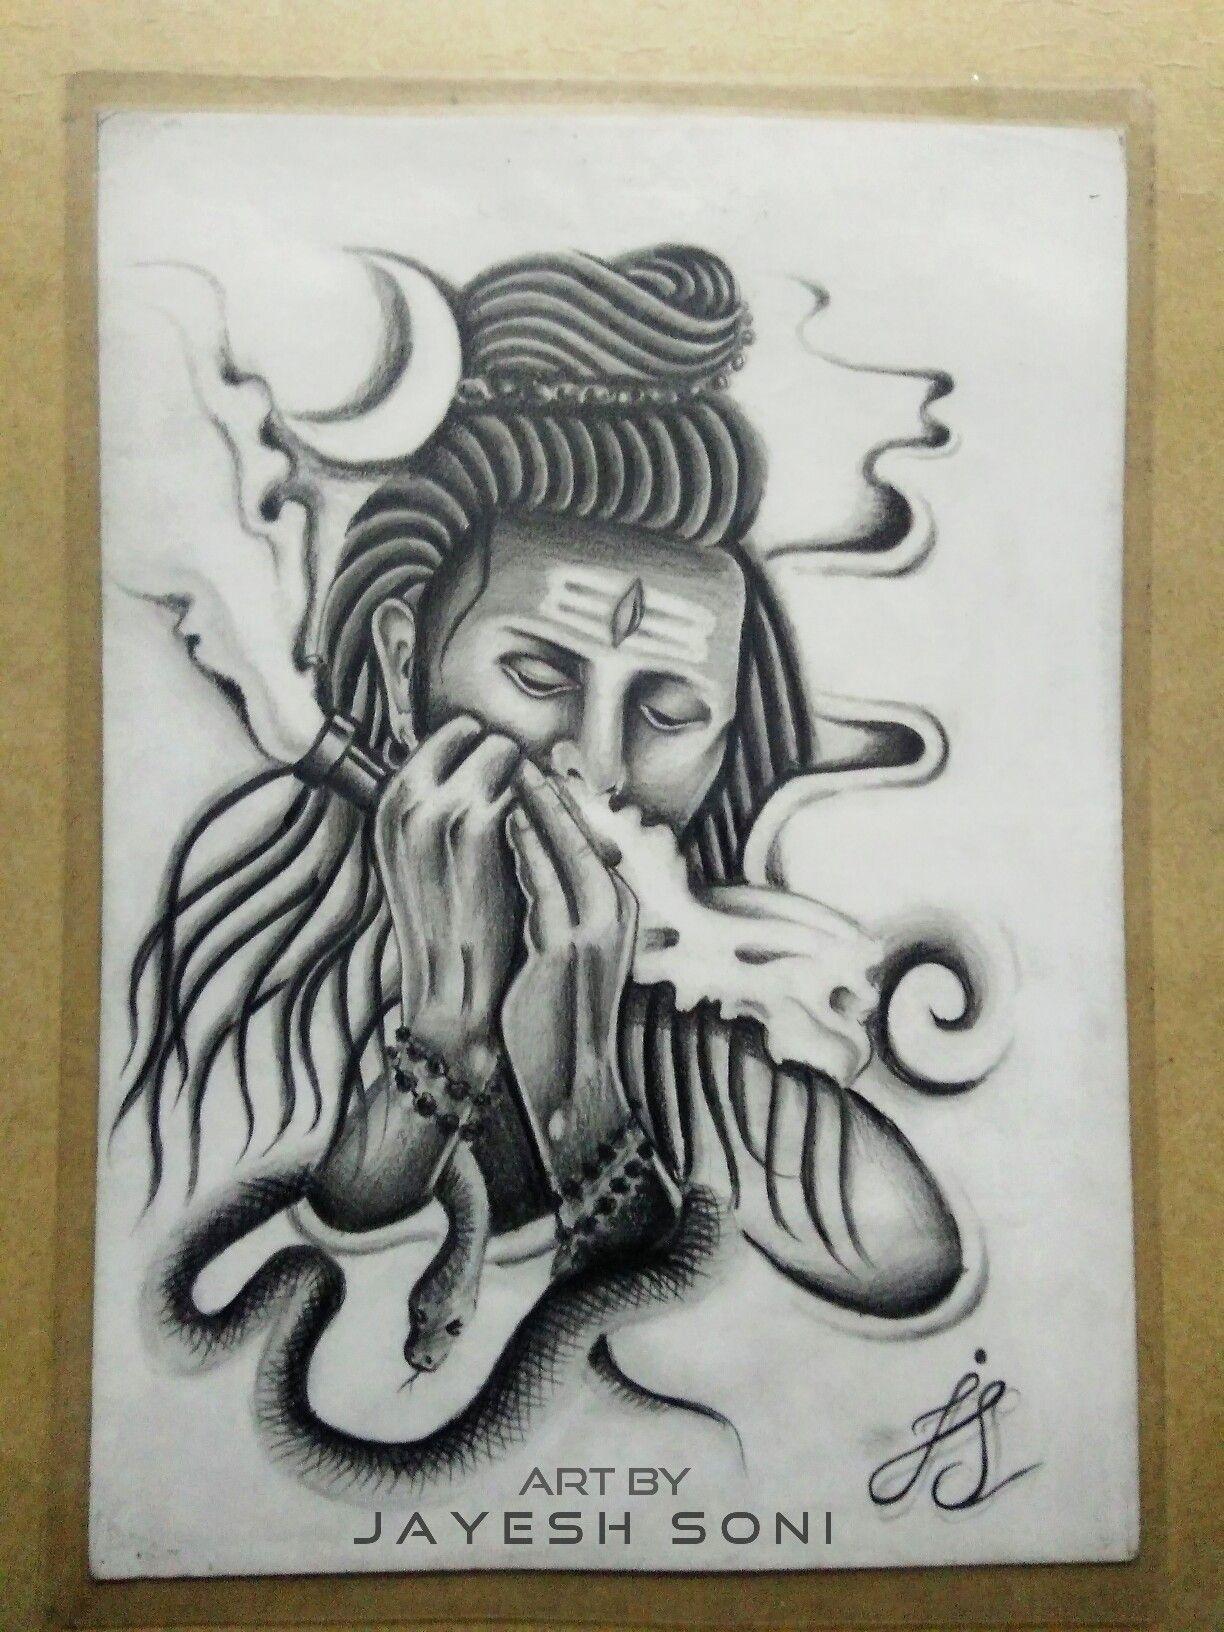 Work 2014 tittle smoking shiva medium pencil drawing art by jayesh soni 😊 hope you all like this 😊 shiva smoke smoking snake moon art artwork